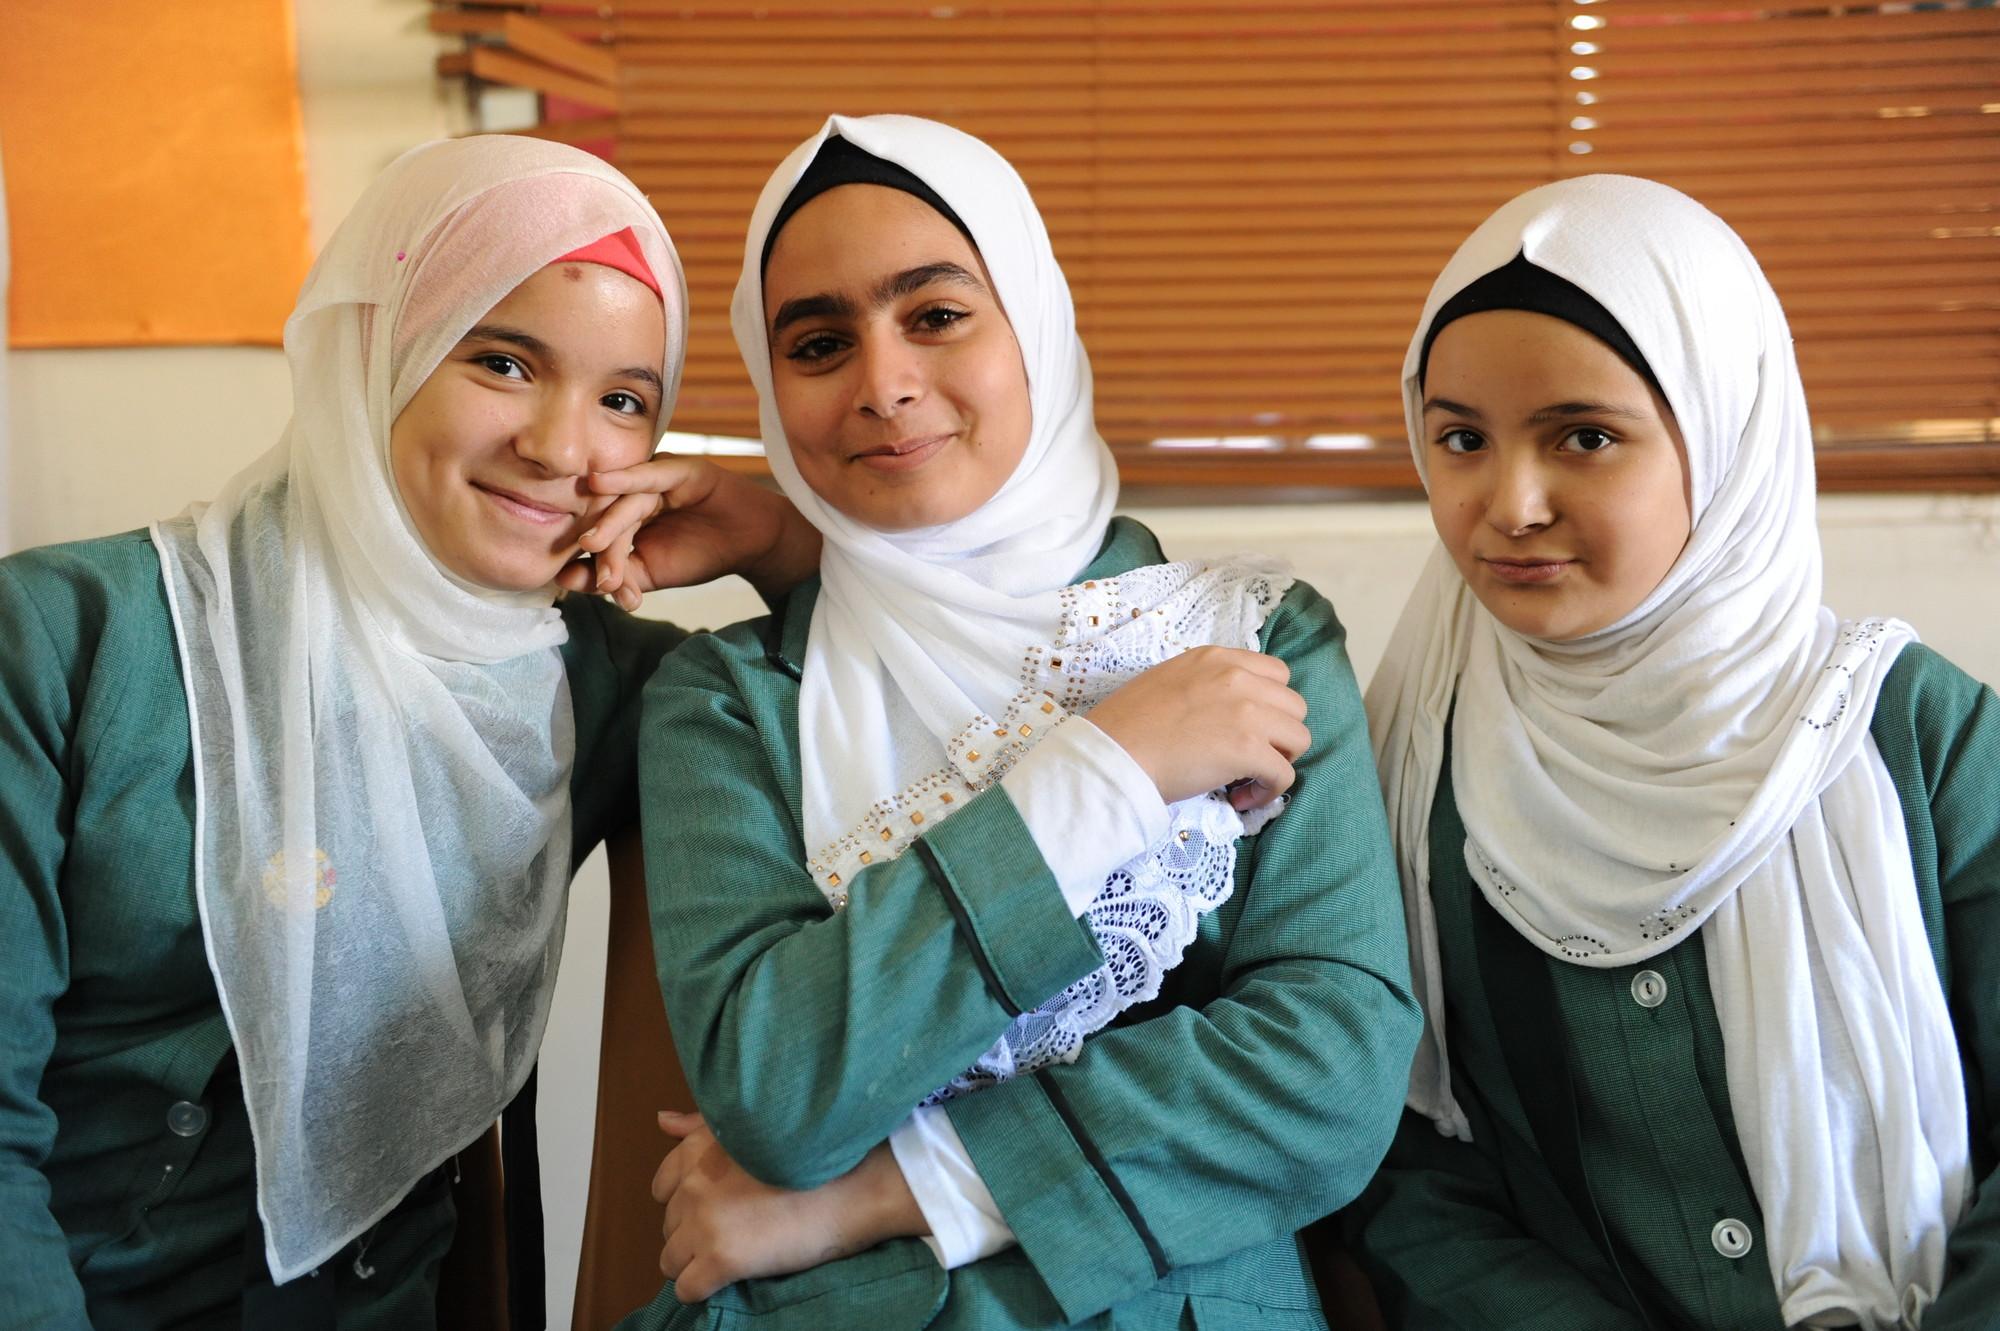 Three adolescent girls smile.